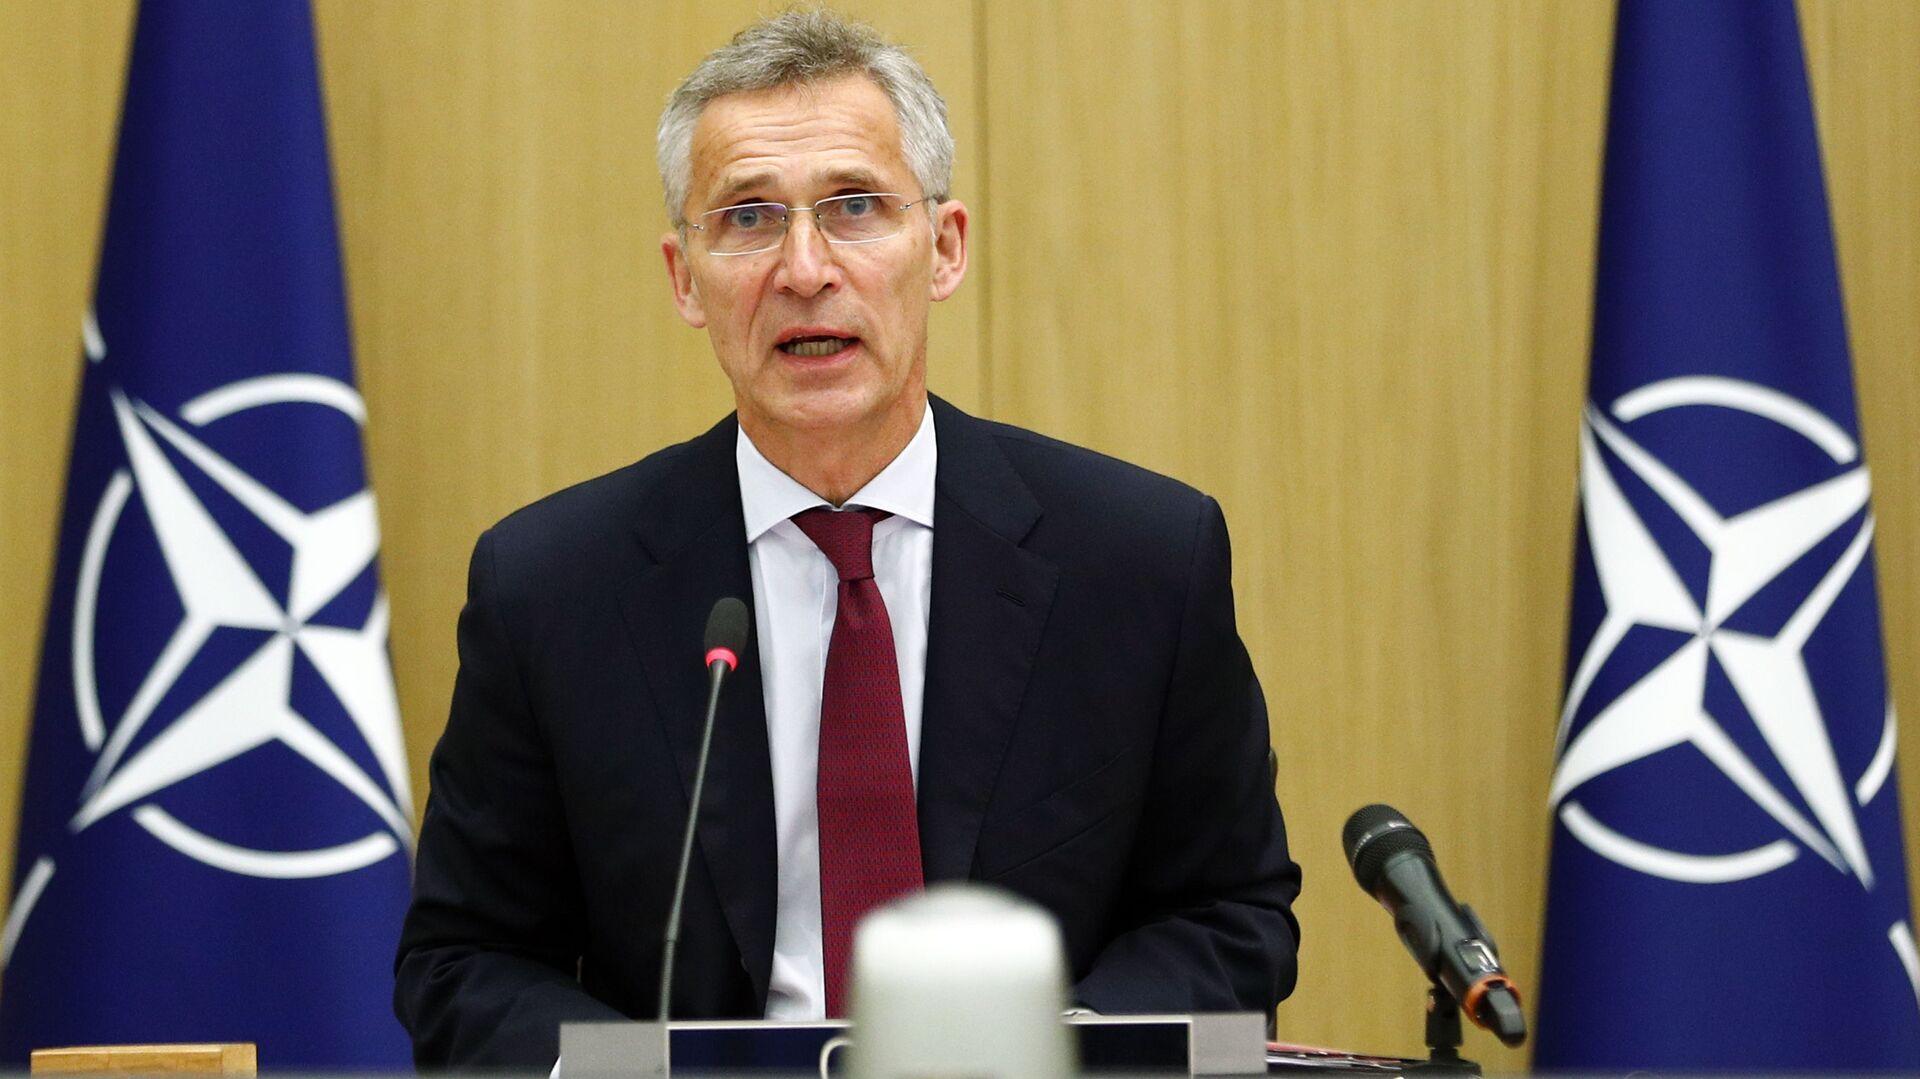 Генерални секретар НАТО-а Јенс Столтенберг - Sputnik Србија, 1920, 01.07.2021